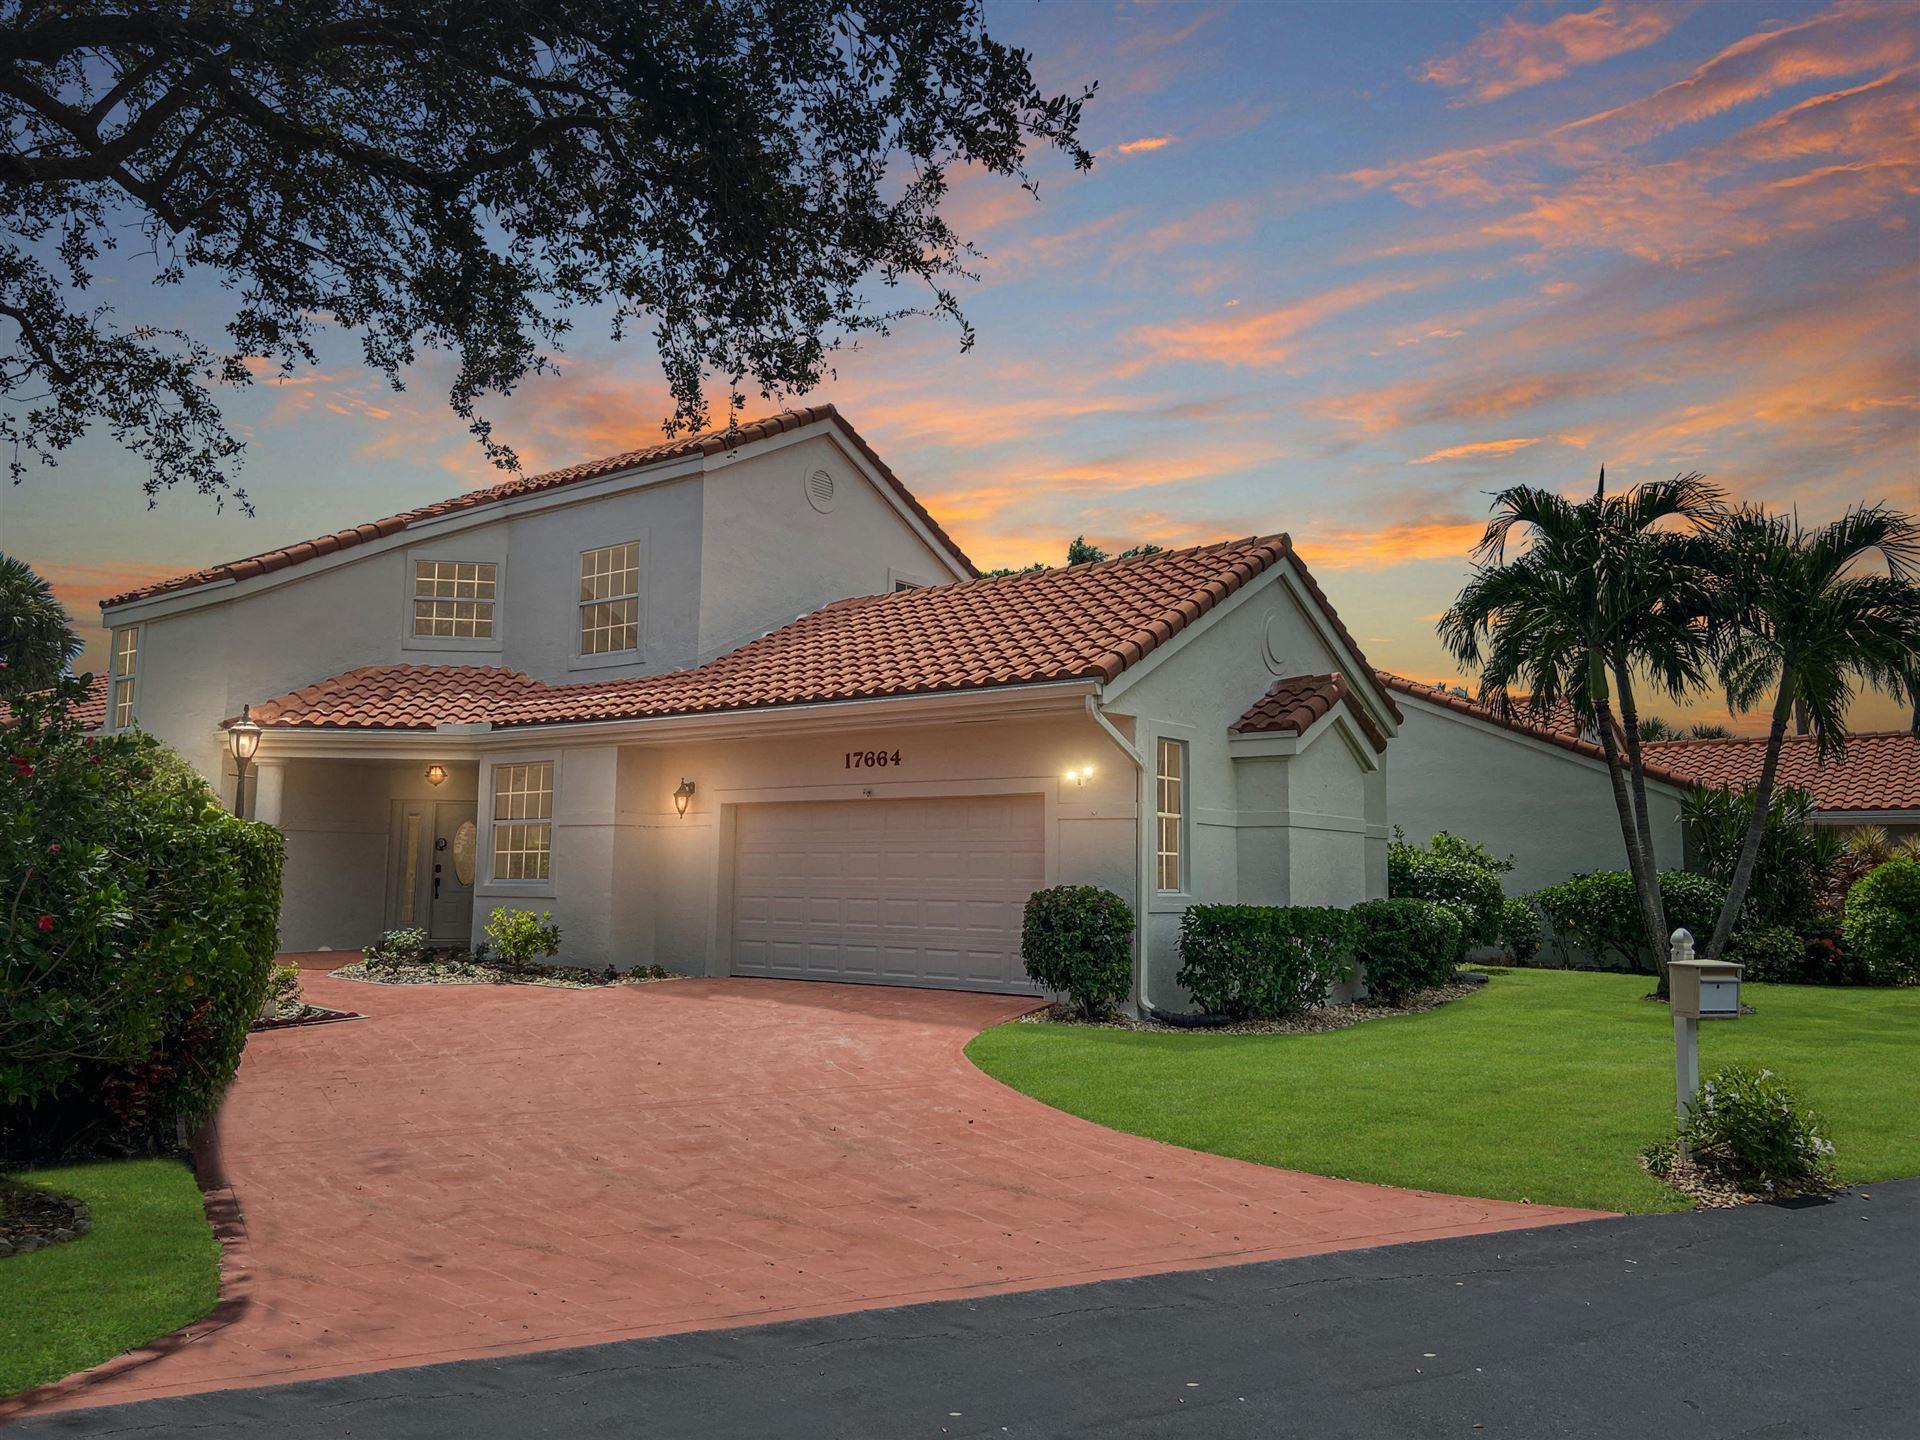 17664 Candlewood Terrace, Boca Raton, FL 33487 - #: RX-10645716